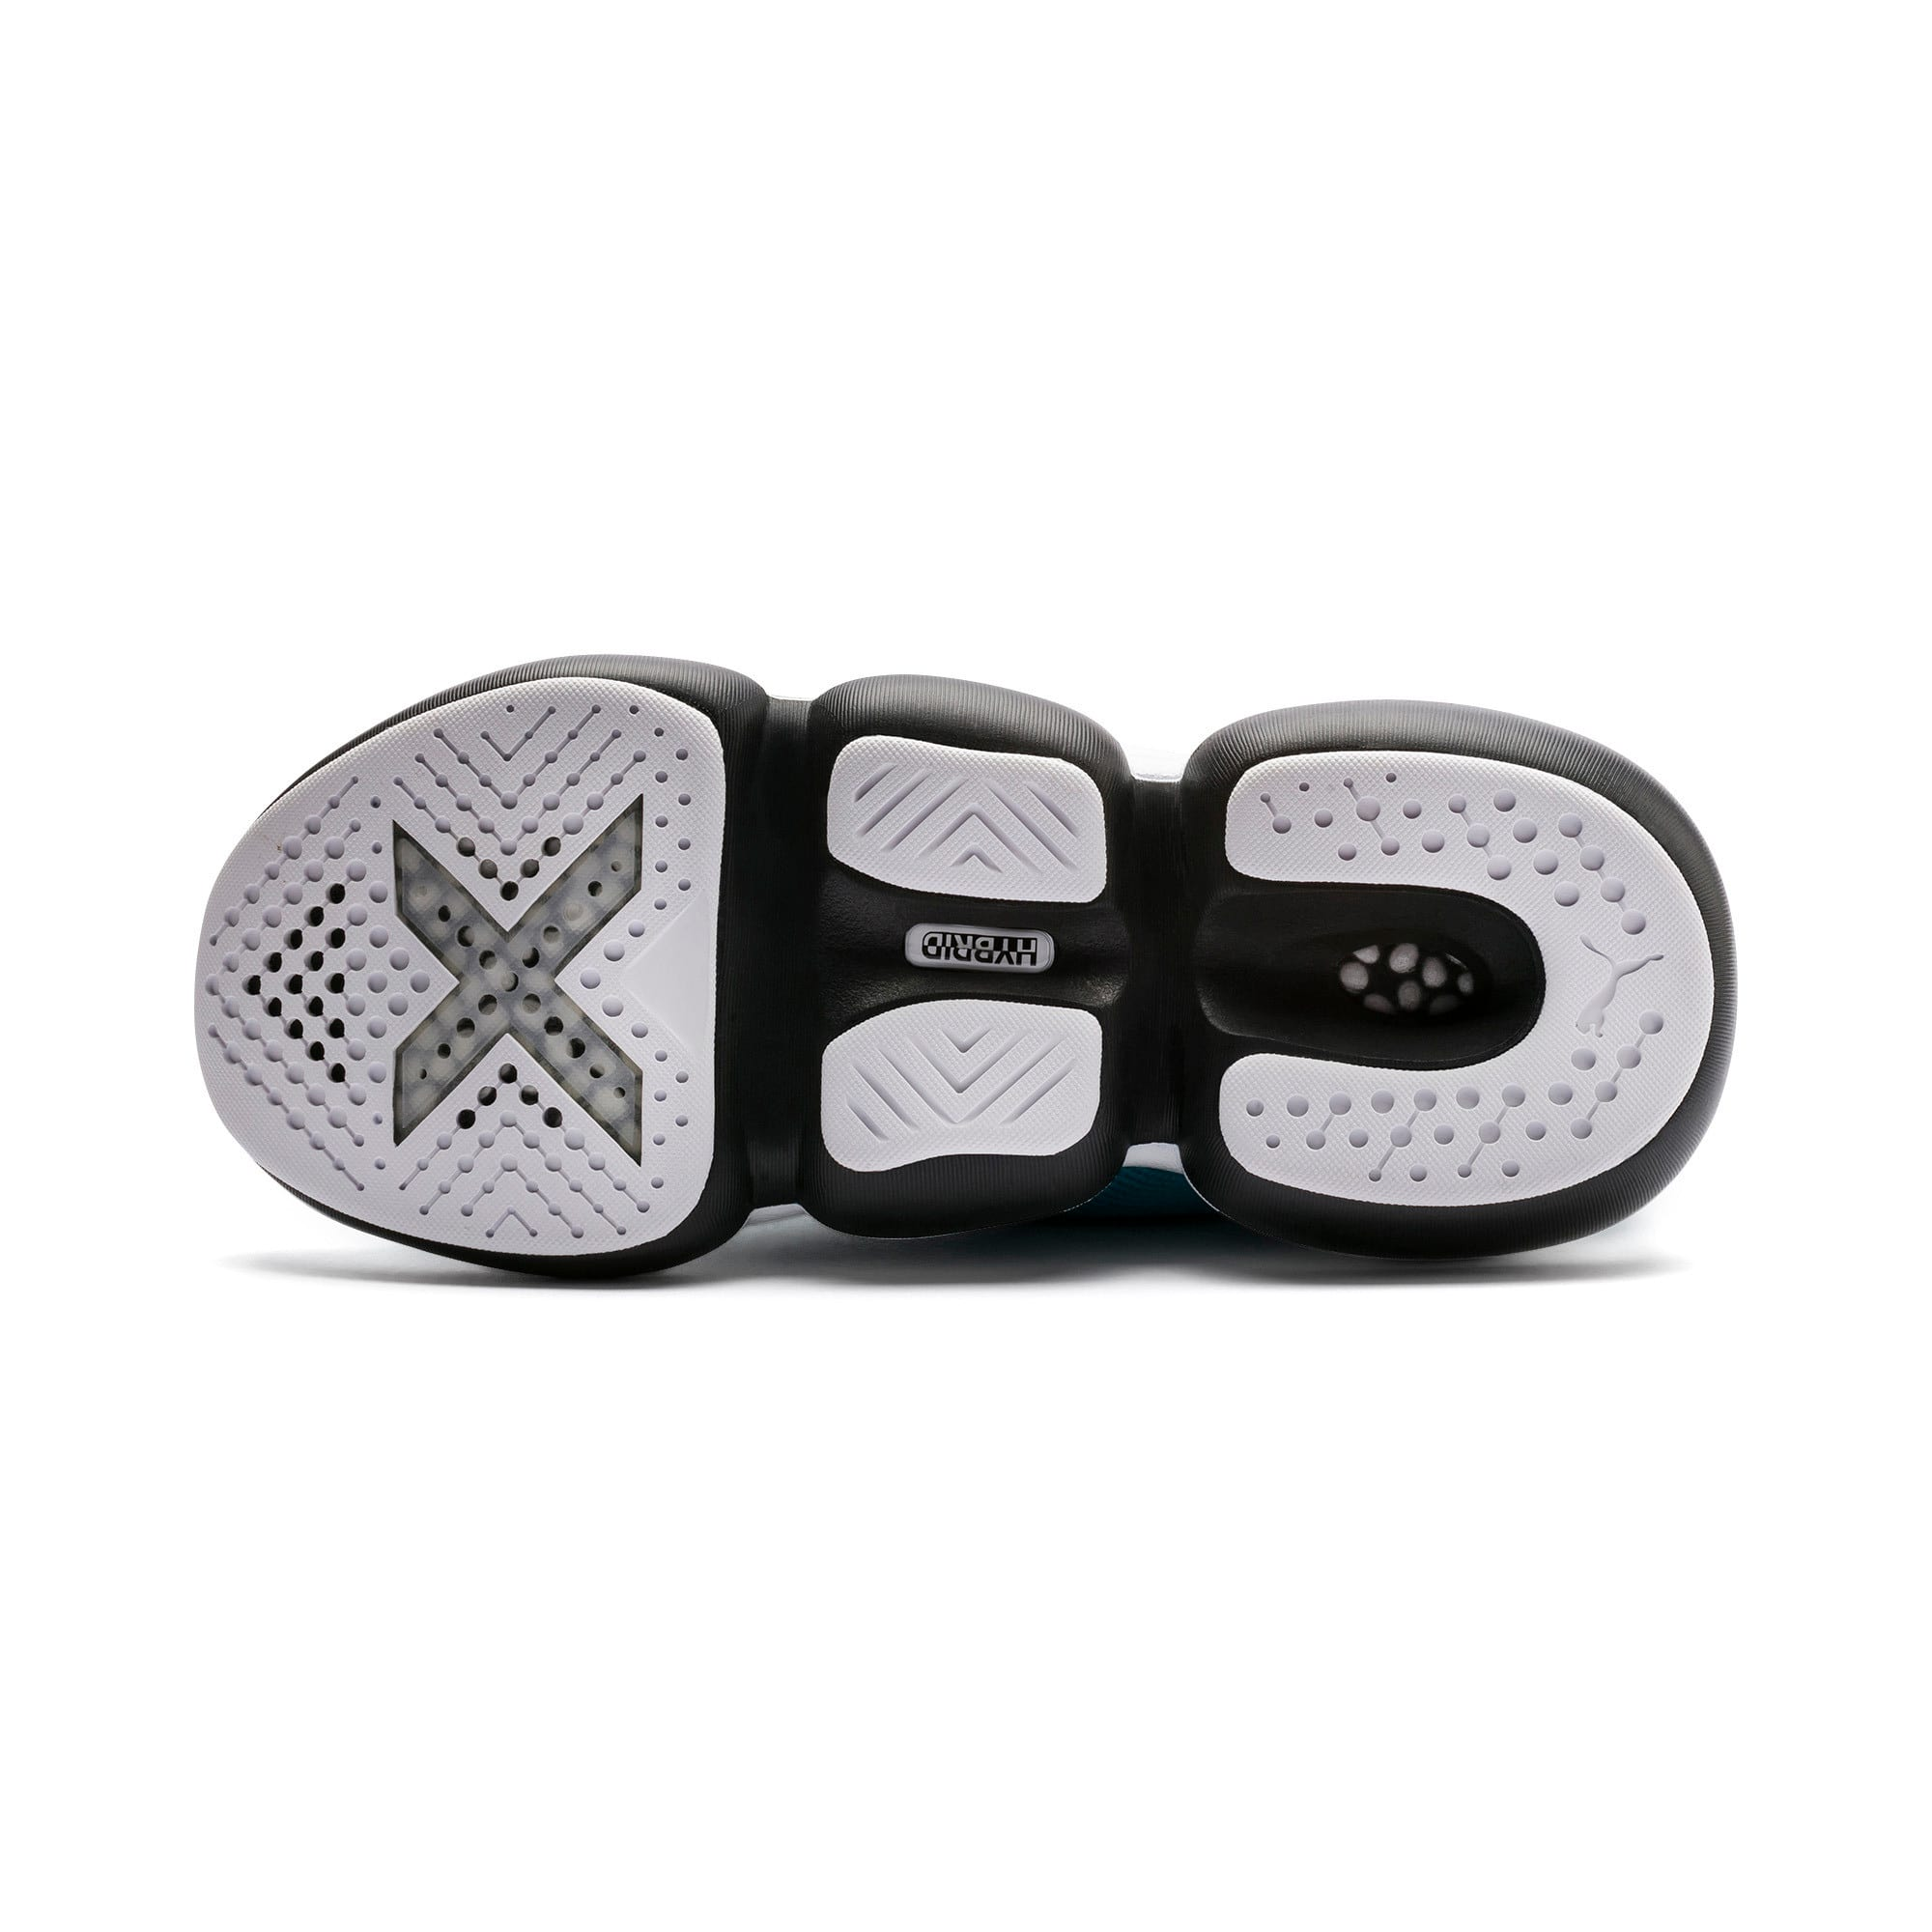 Imagen en miniatura 5 de Zapatillas de mujer Mode XT Iridescent Trailblazer, Caribbean Sea-Puma White, mediana